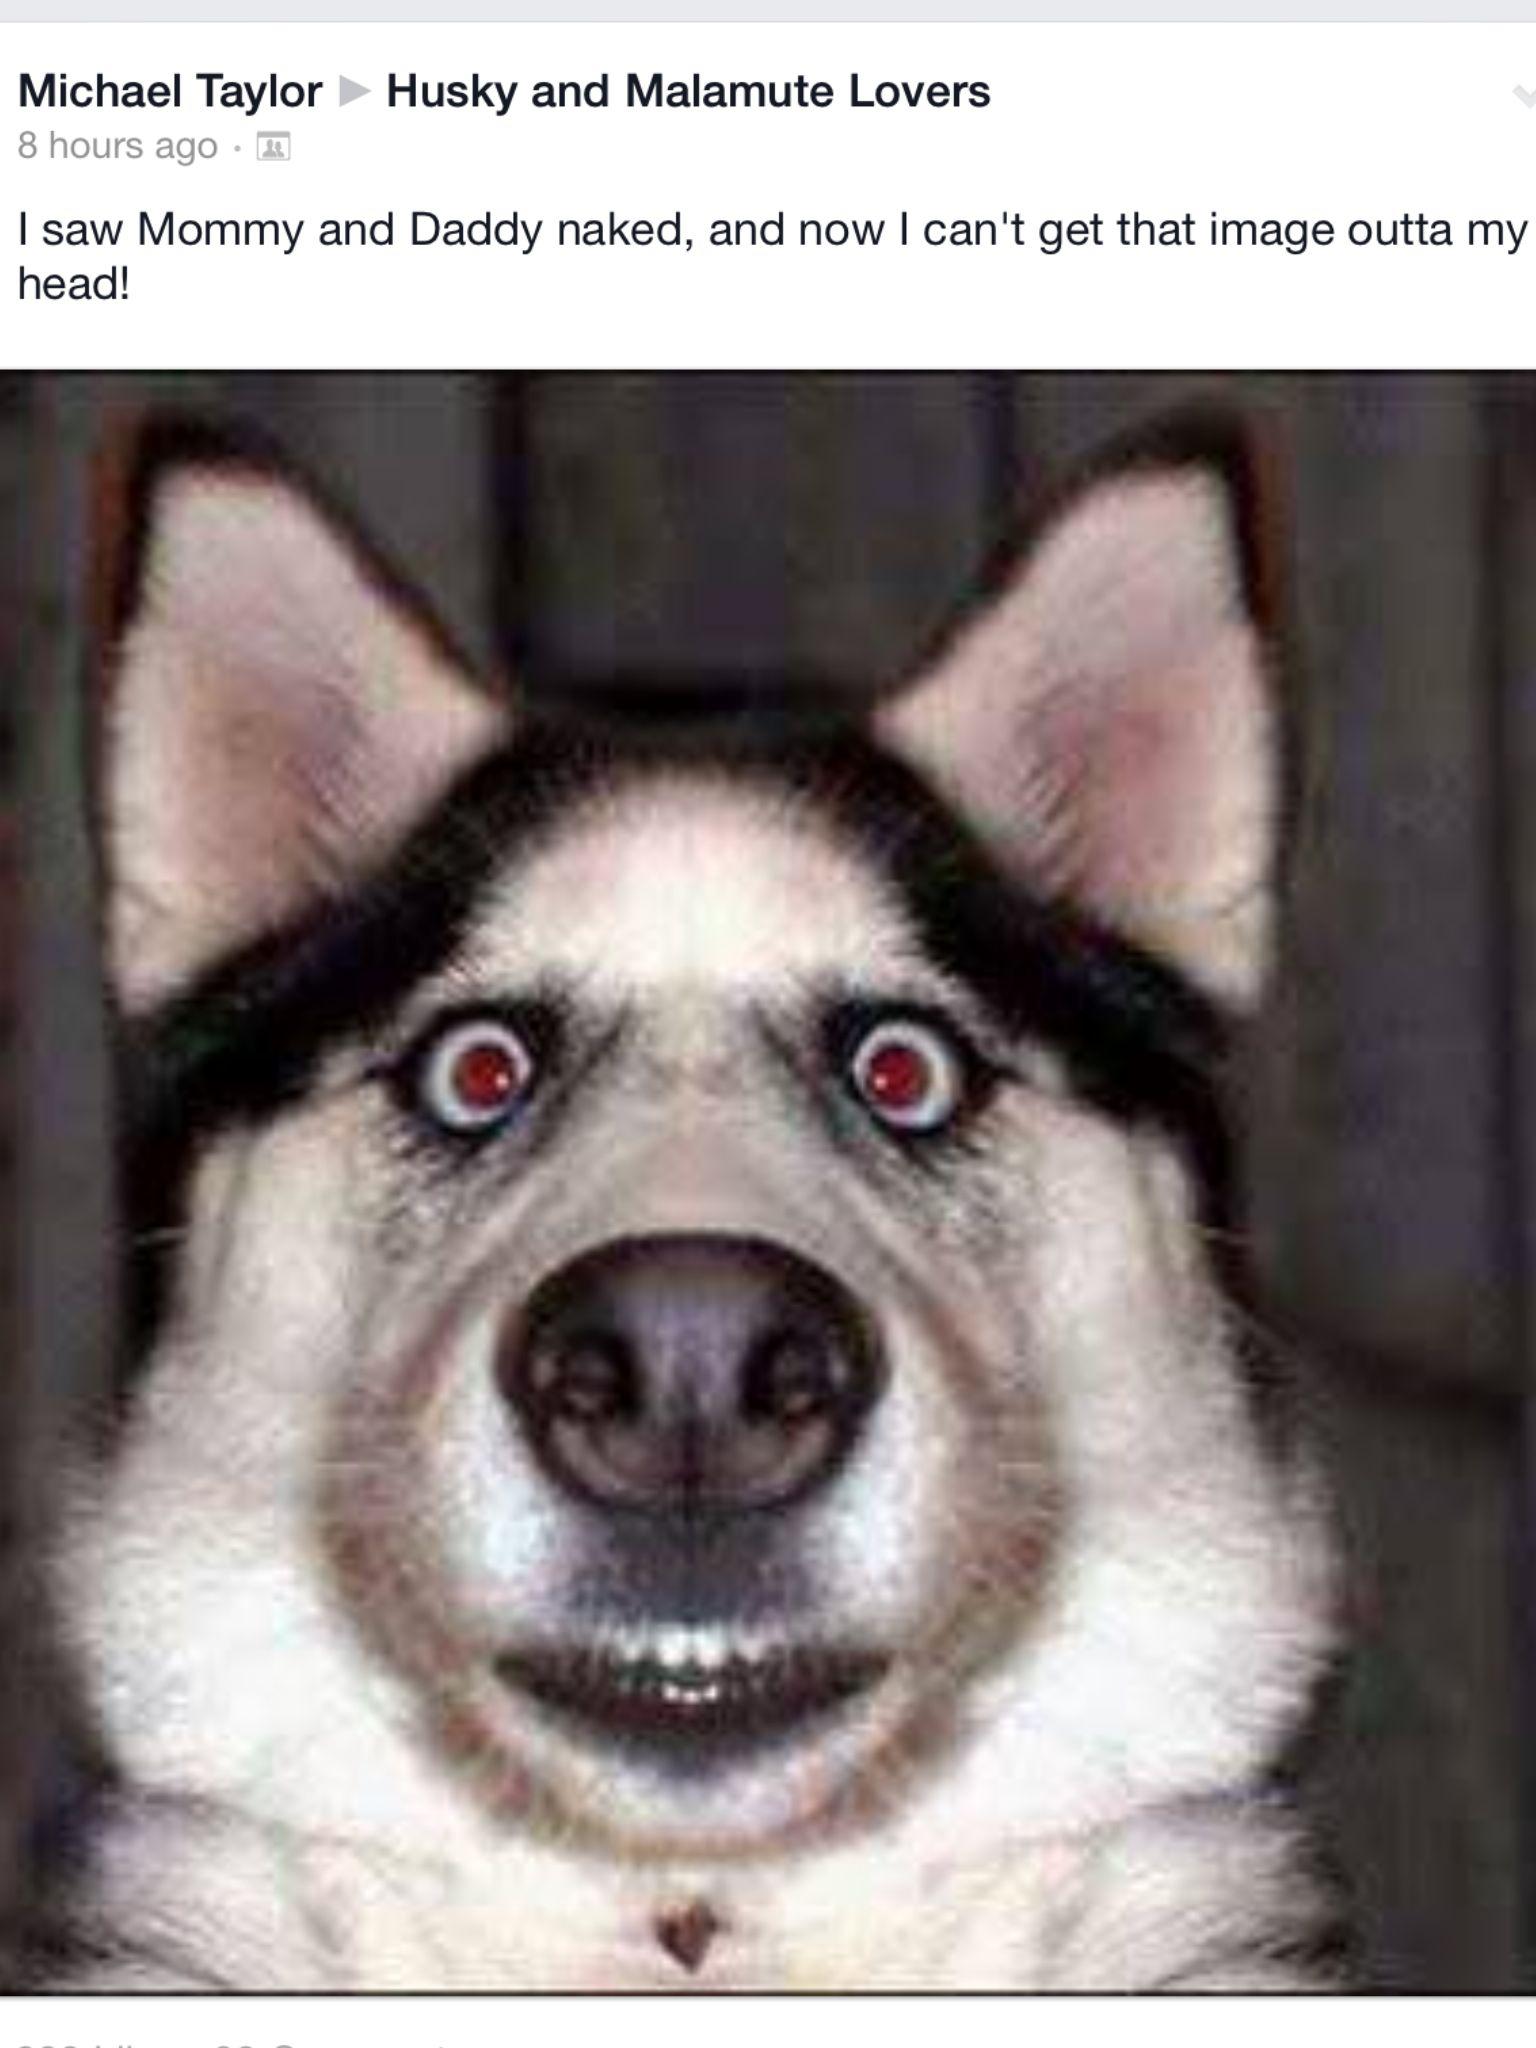 On The Floor Rolling Lol Imagenes Divertidas De Perros Humor De Perros Humor Divertido Sobre Animales